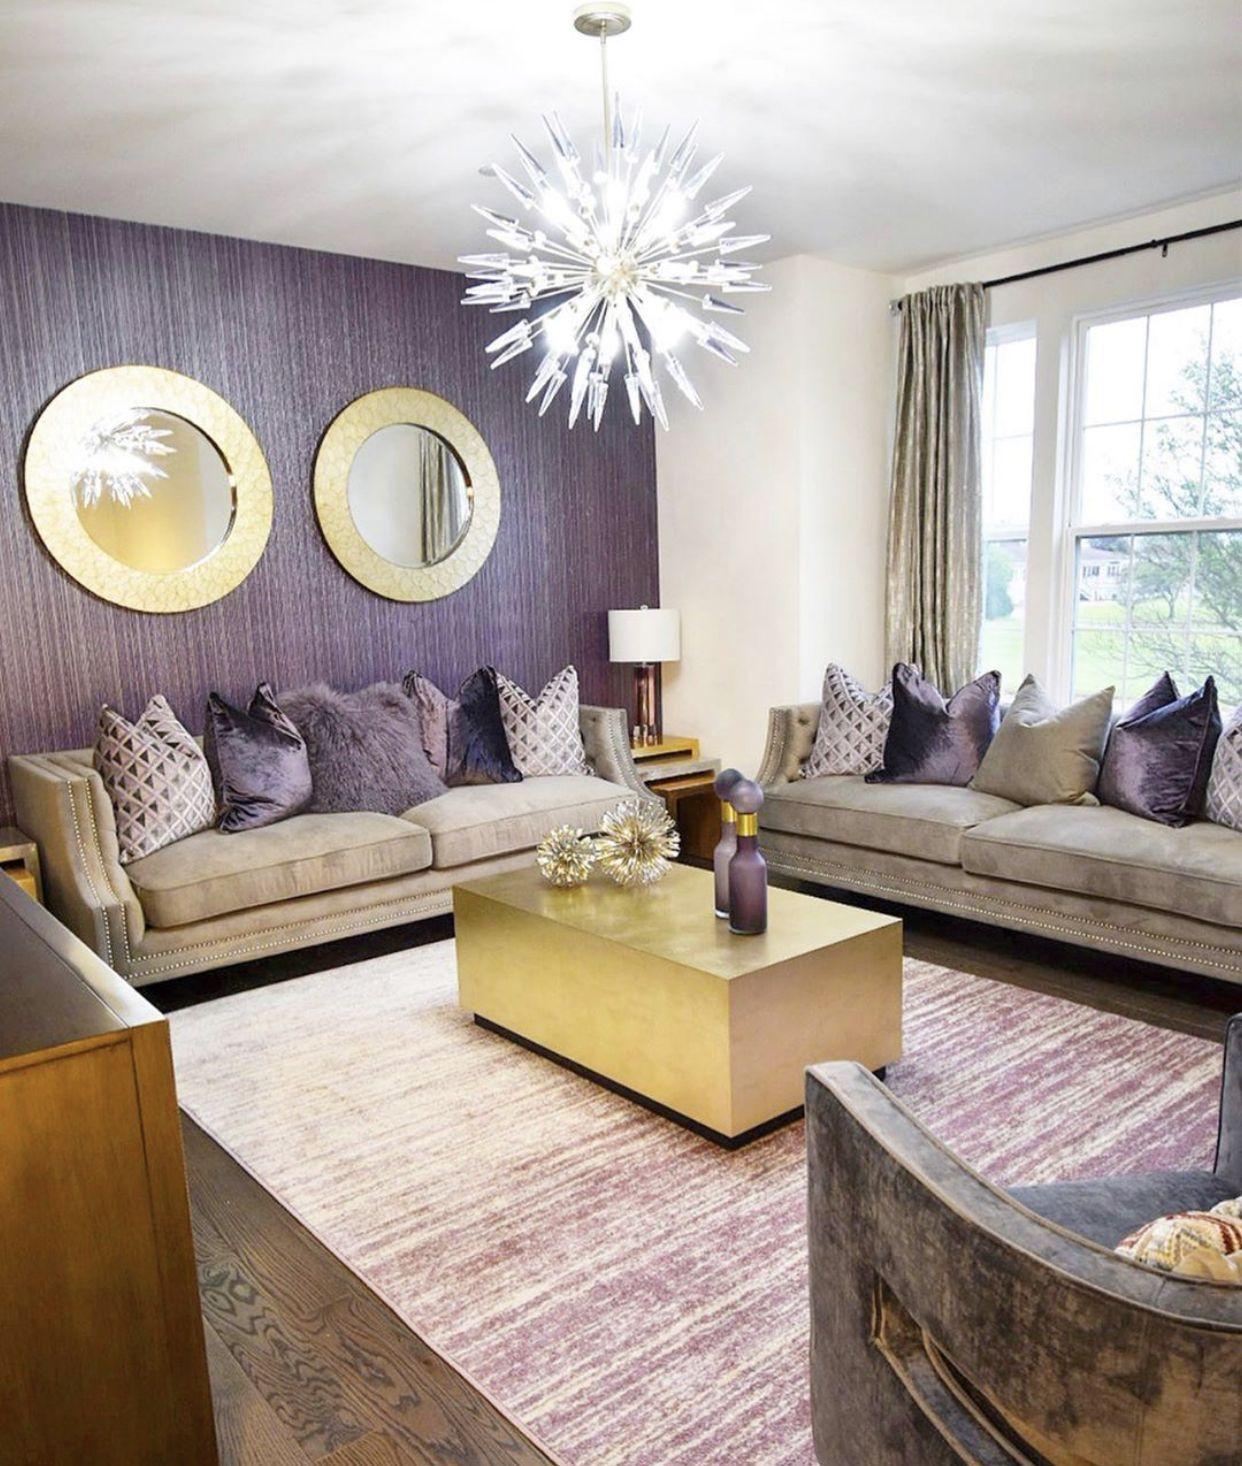 Glam Purple Gold Living Room Purple Living Room Gold Living Room Decor Living Room Colors Plum living room decor